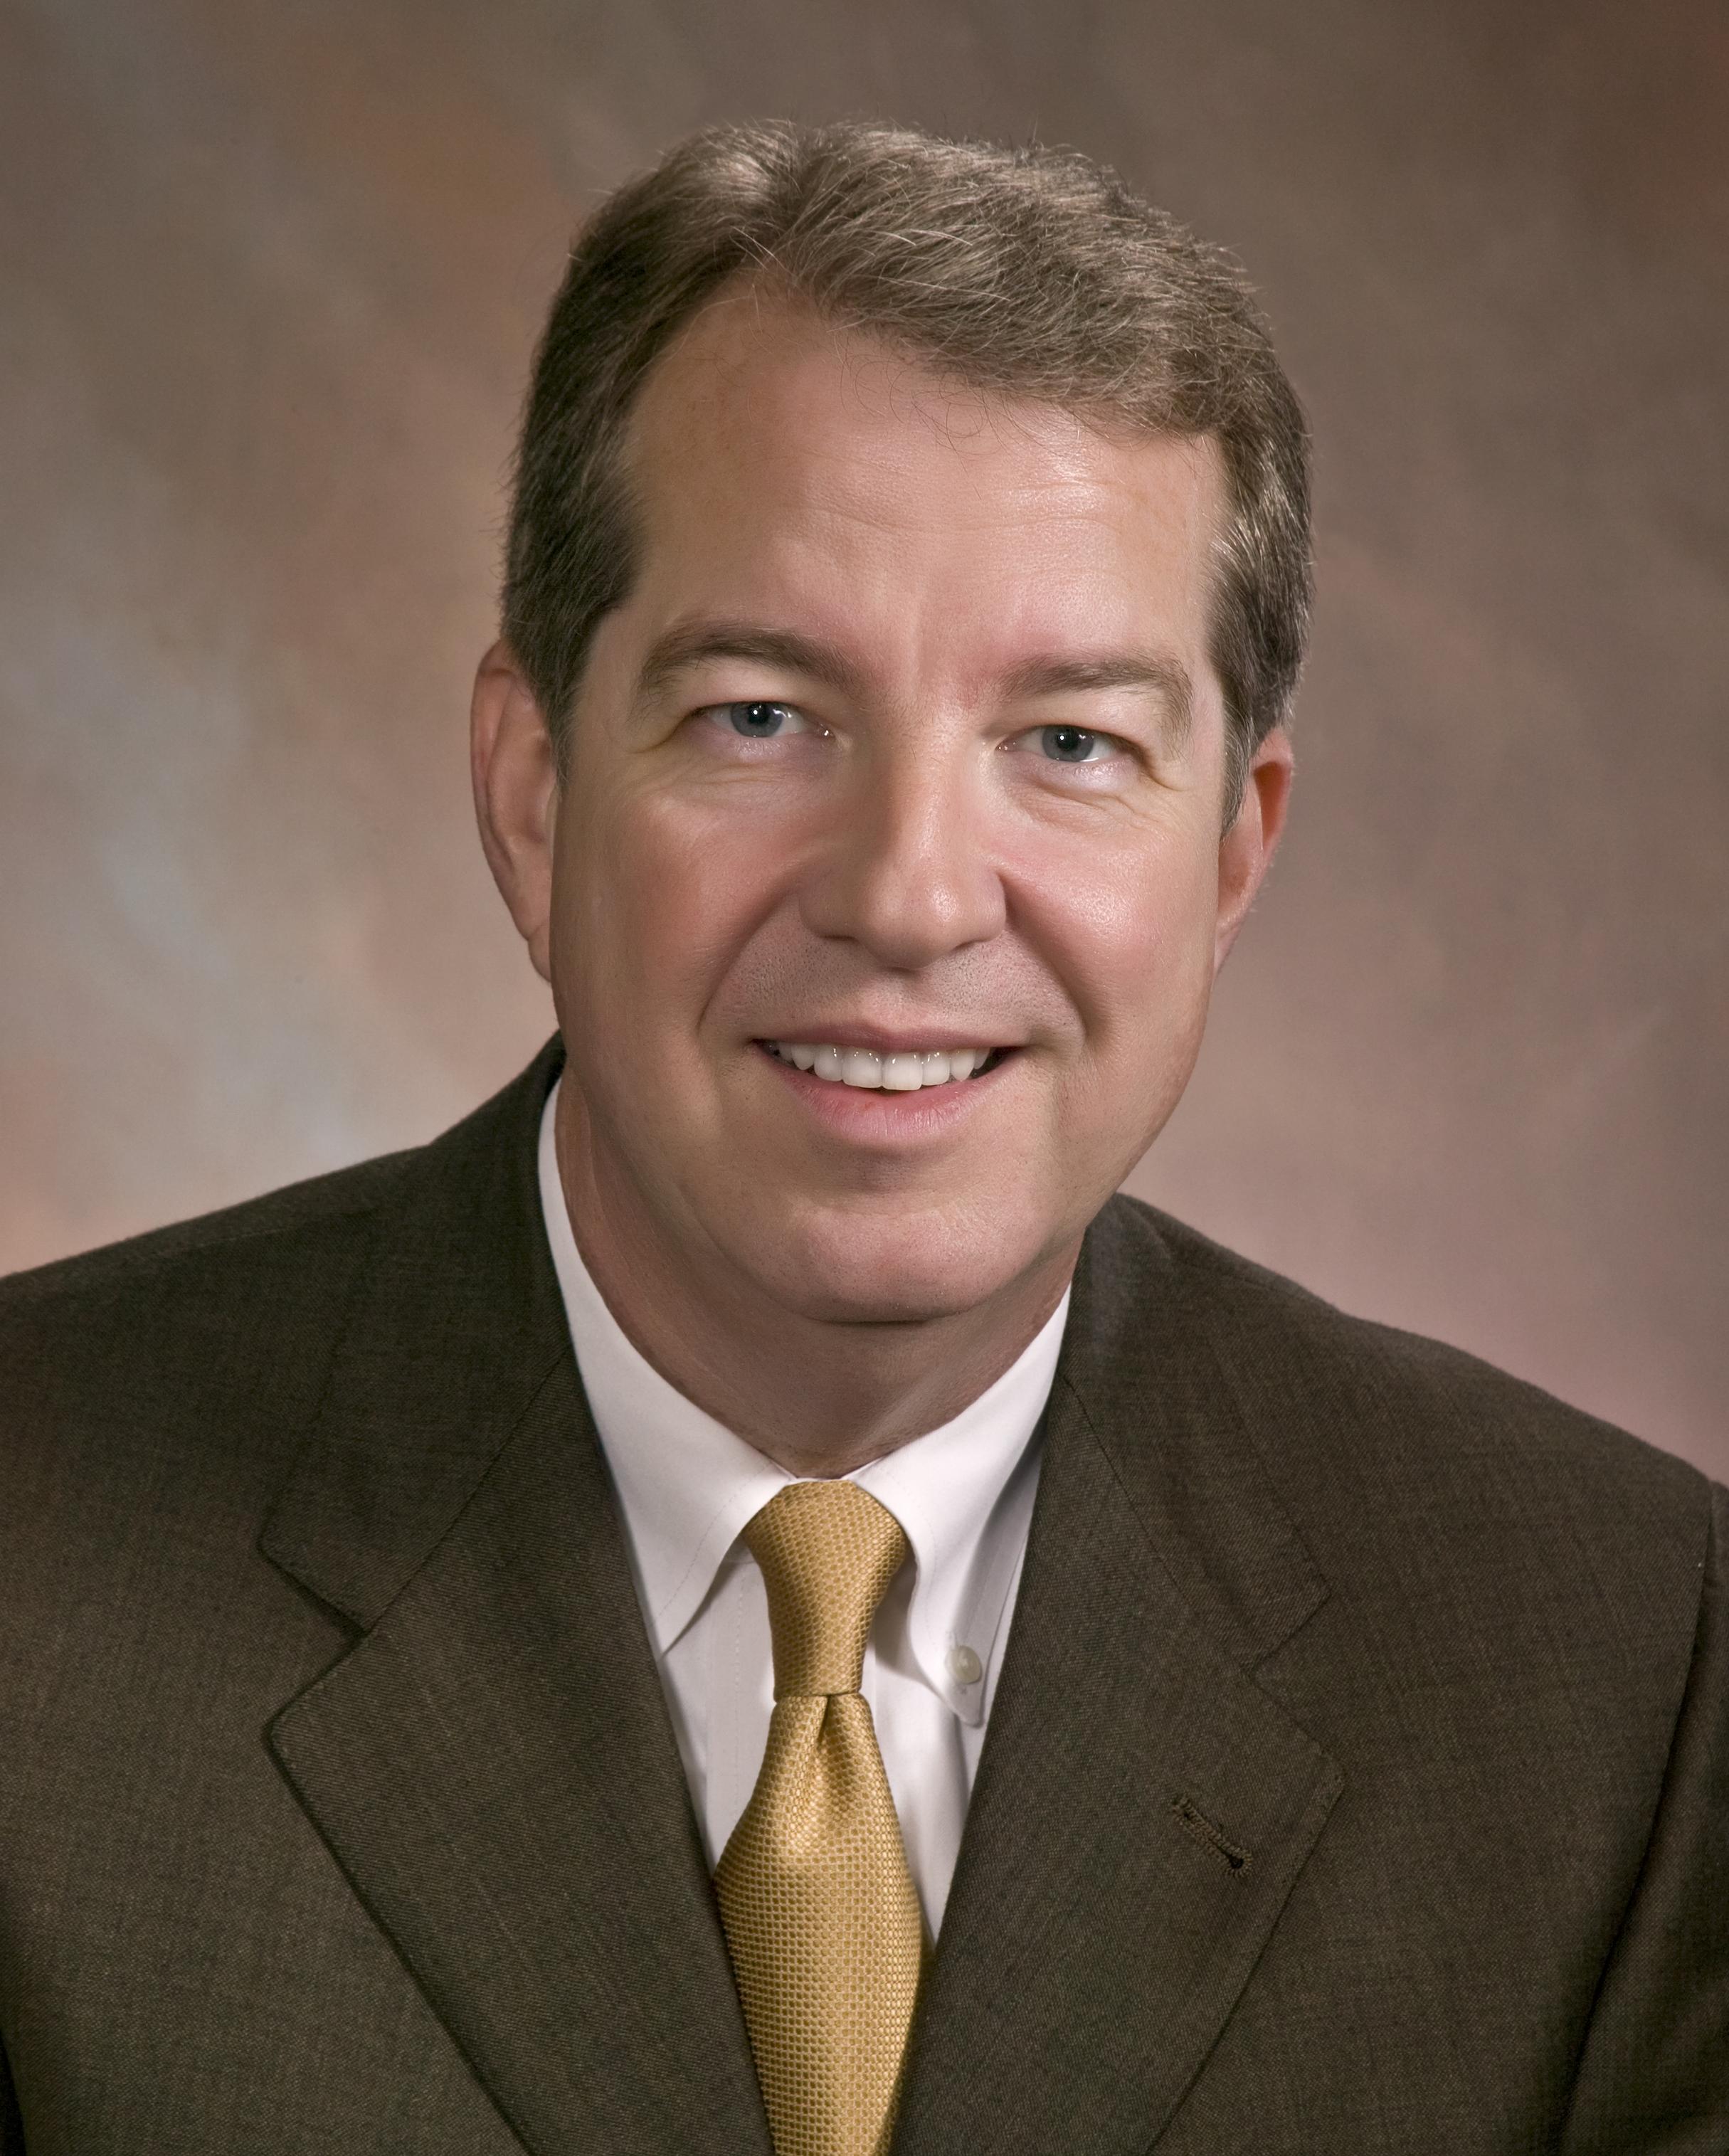 Dr. Steven Micheal Dorman